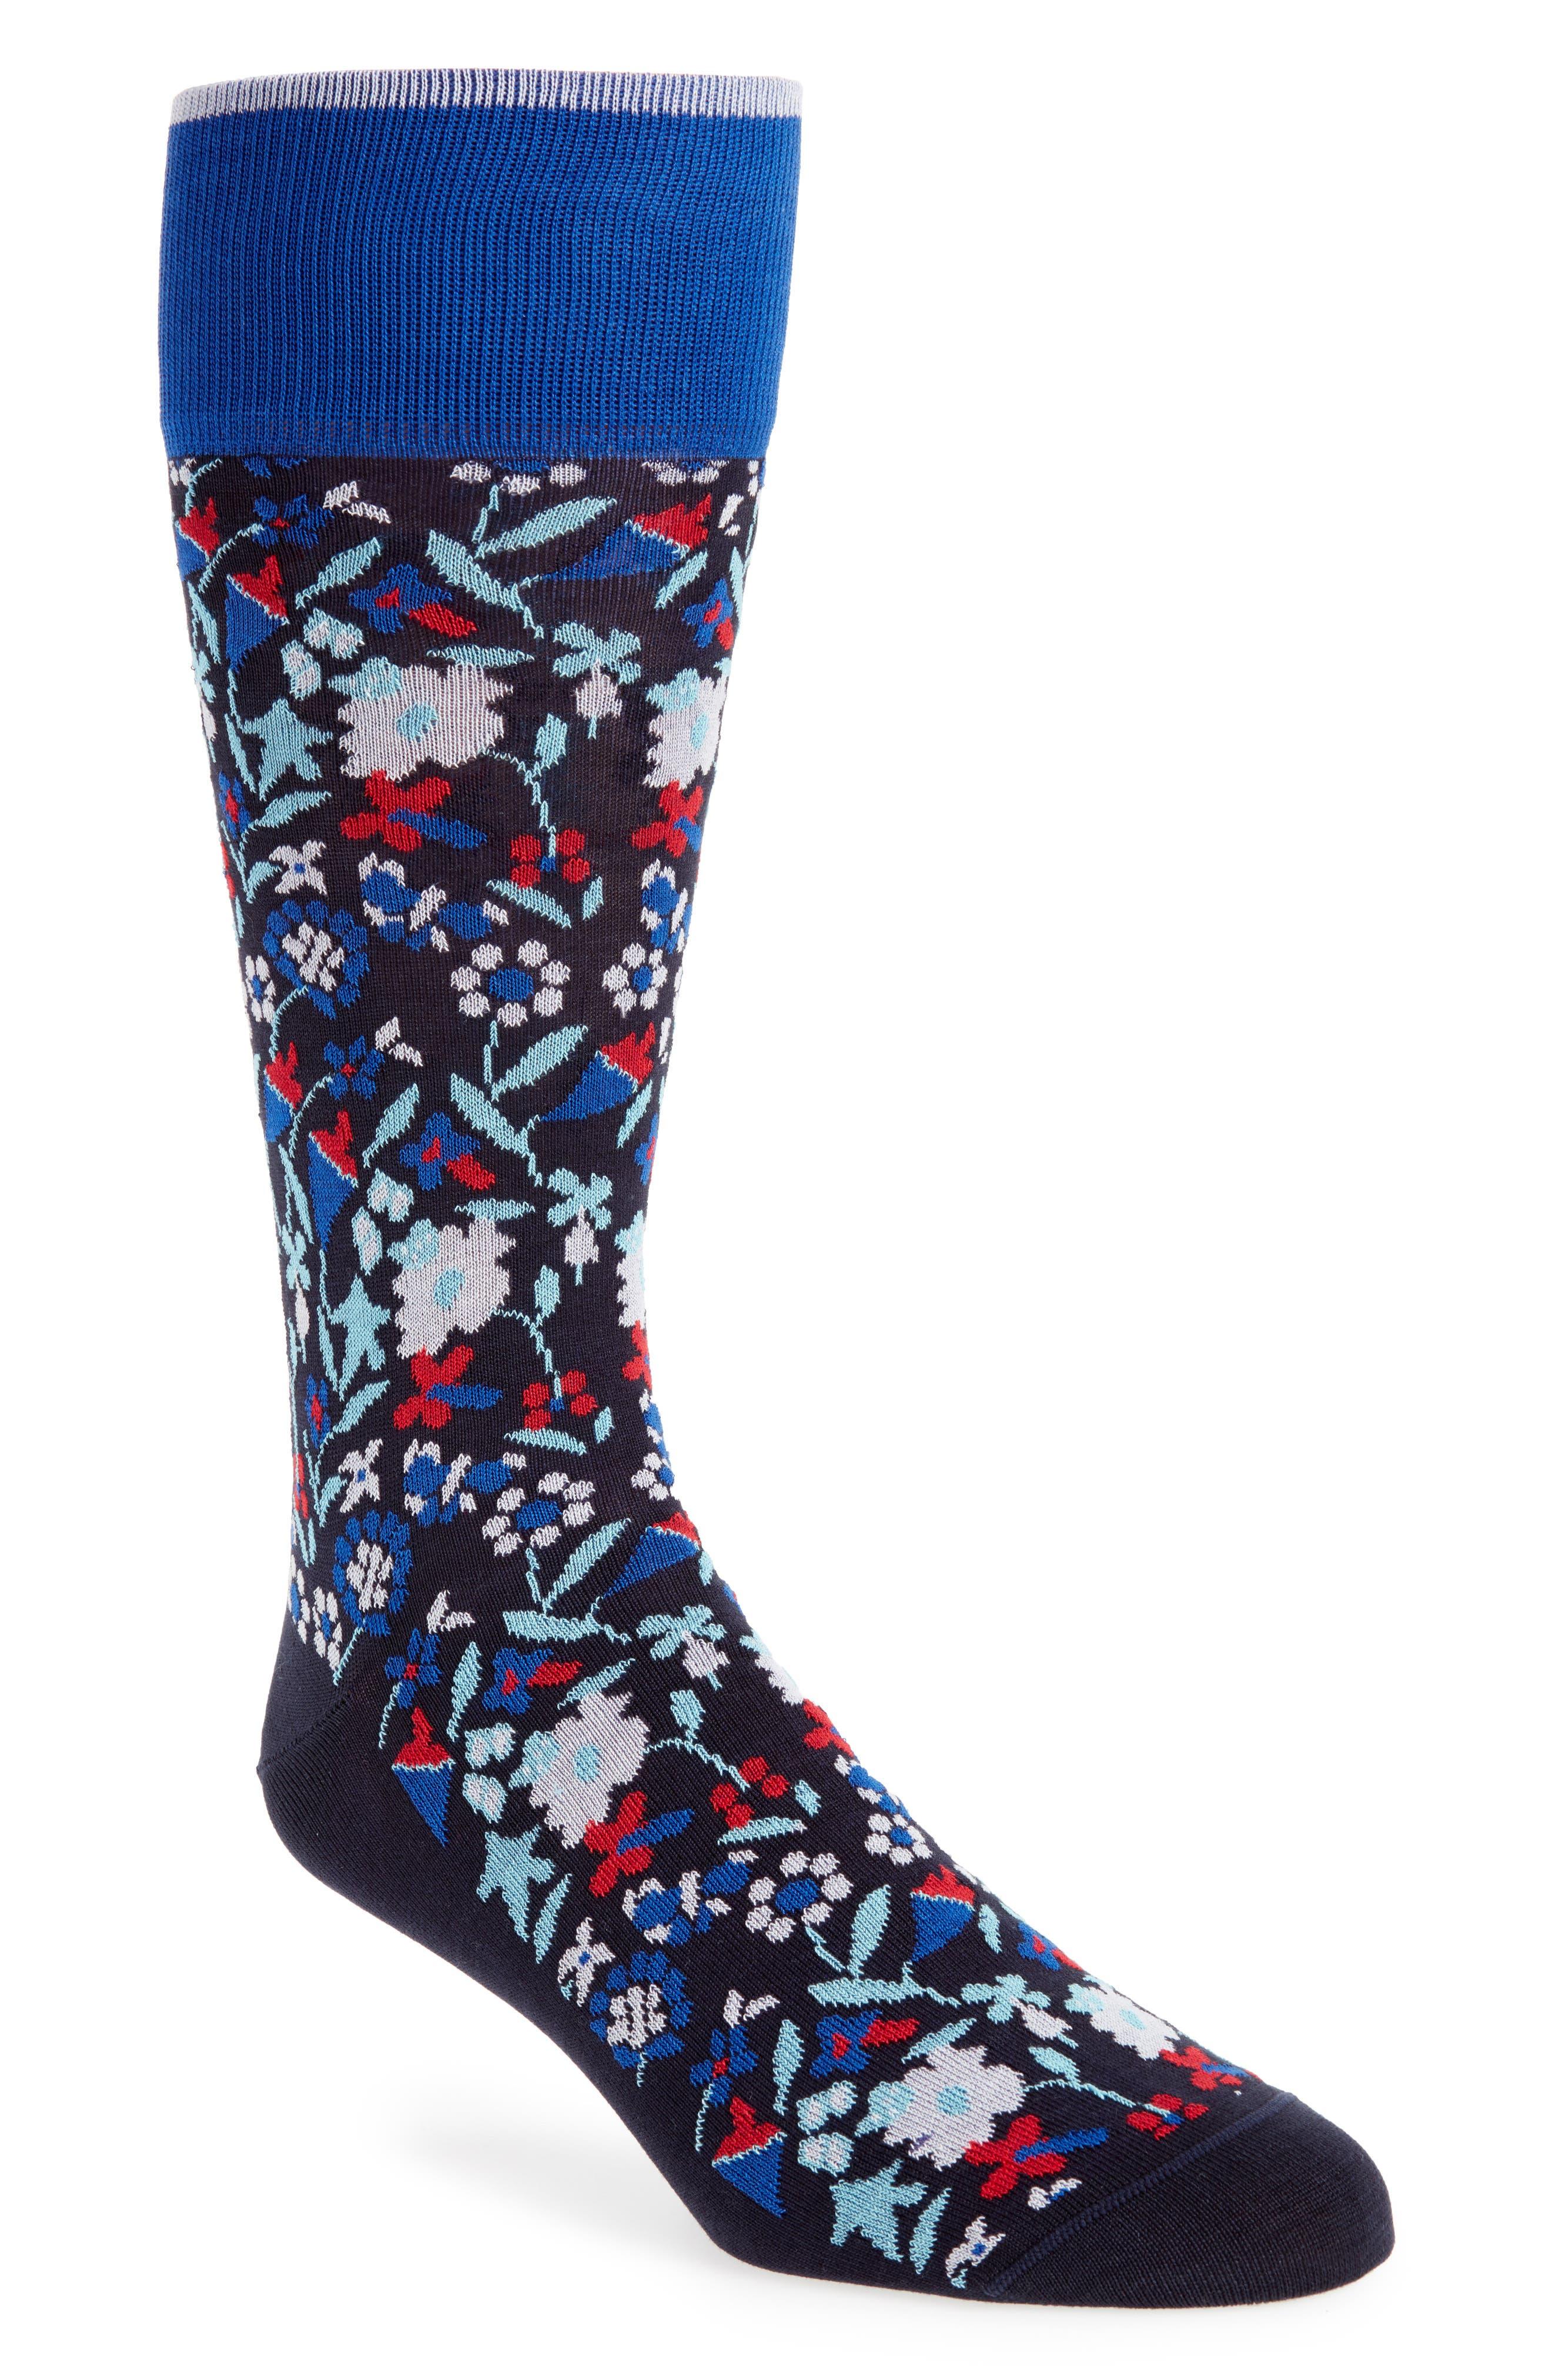 Tapestry Floral Socks,                             Main thumbnail 1, color,                             NAVY/ RED